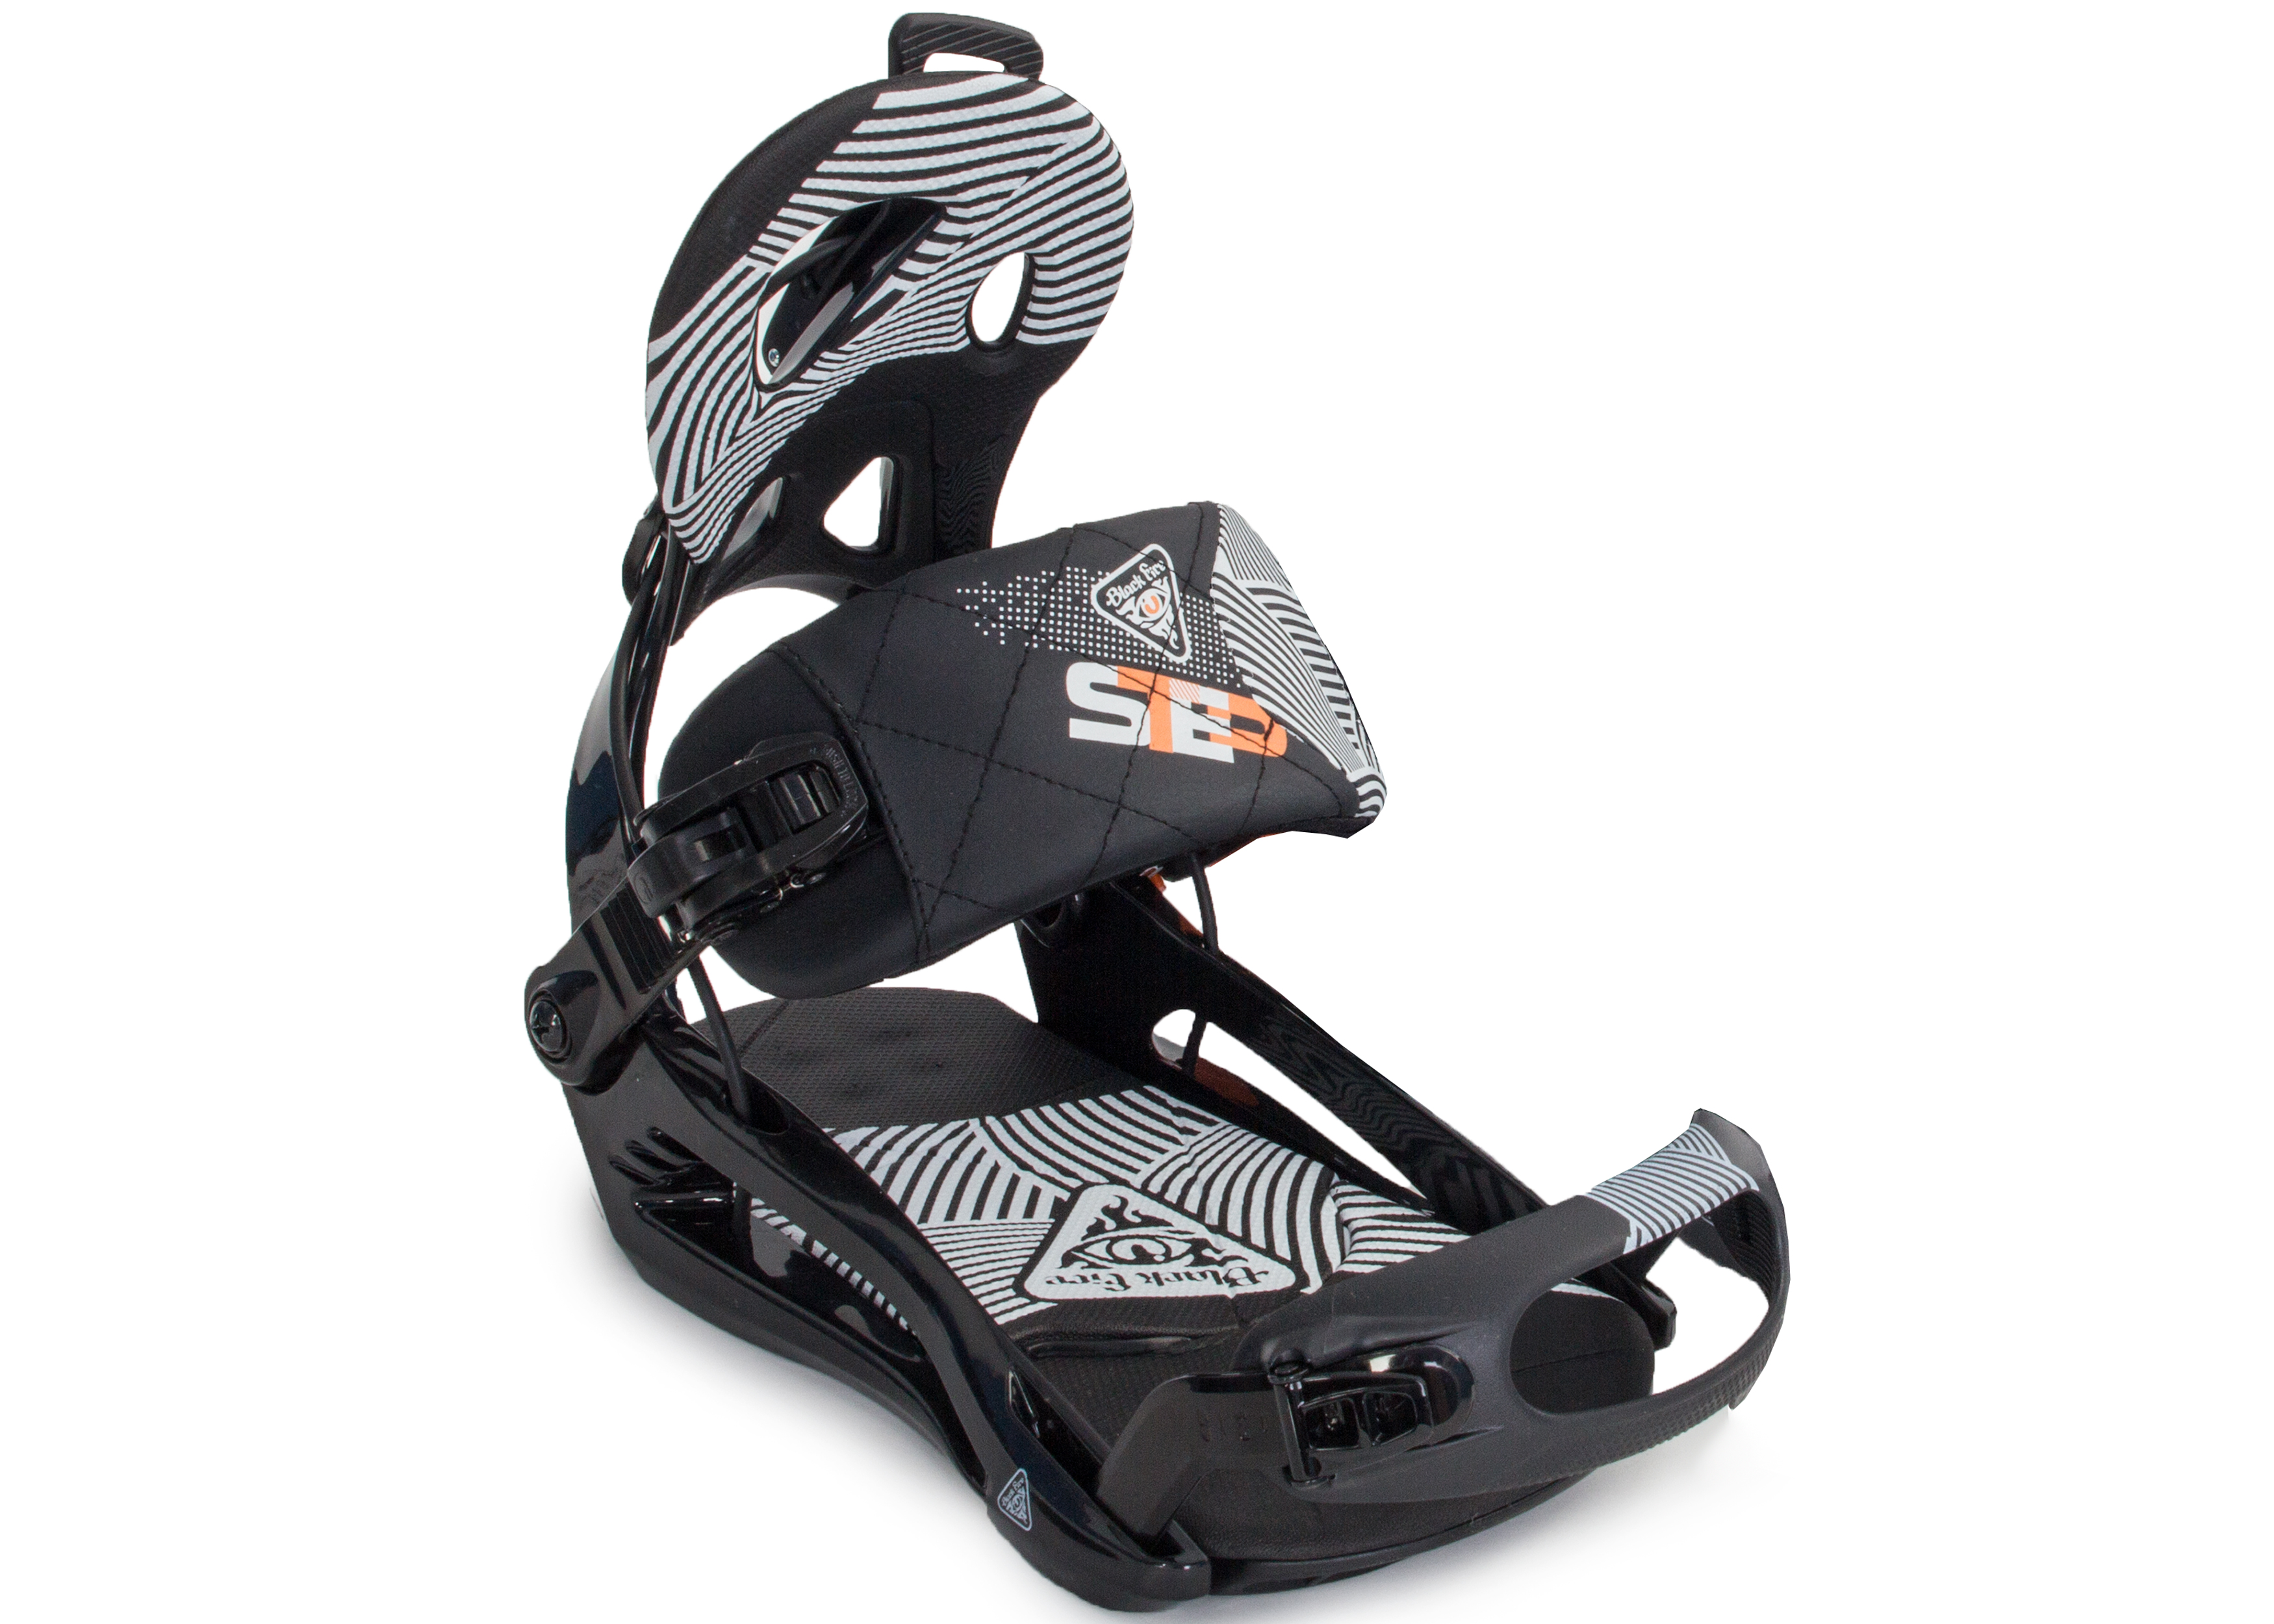 a57a4e7cdf6c Крепления для сноуборда Black Fire 2014-15 Step FT Lux - Сеть ...